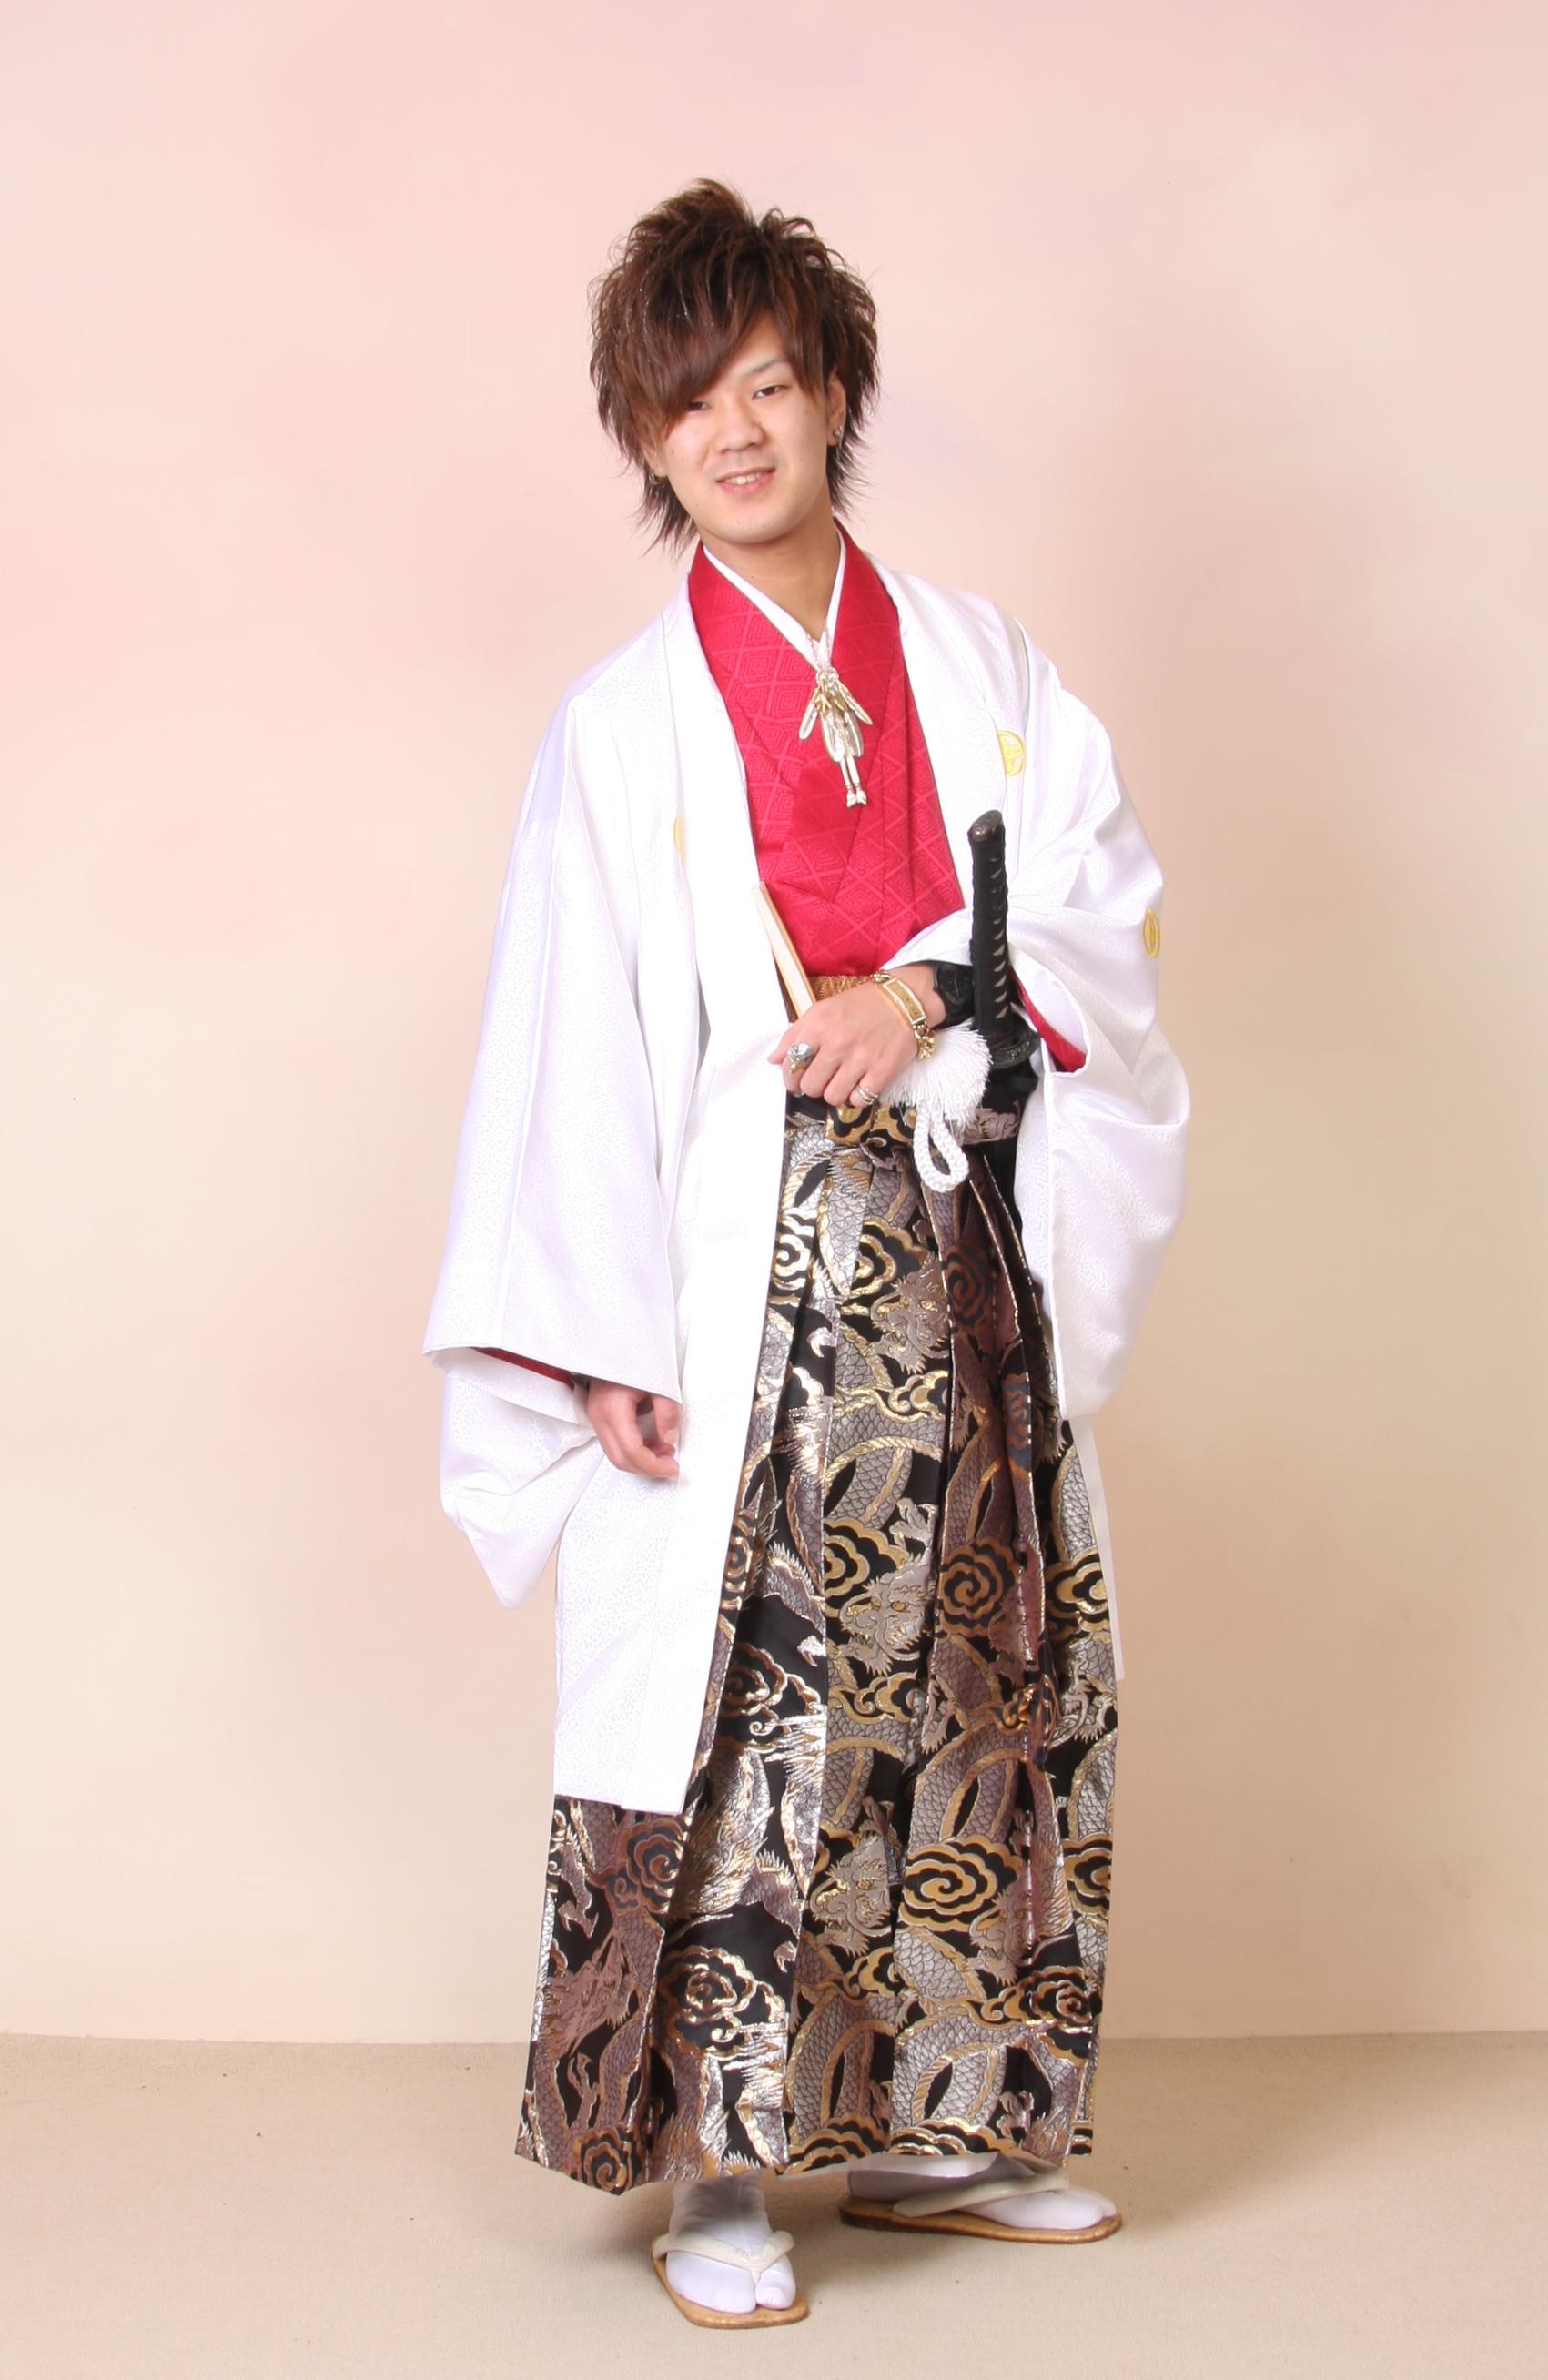 MIX(羽織と長着の色を自由にチョイス!)